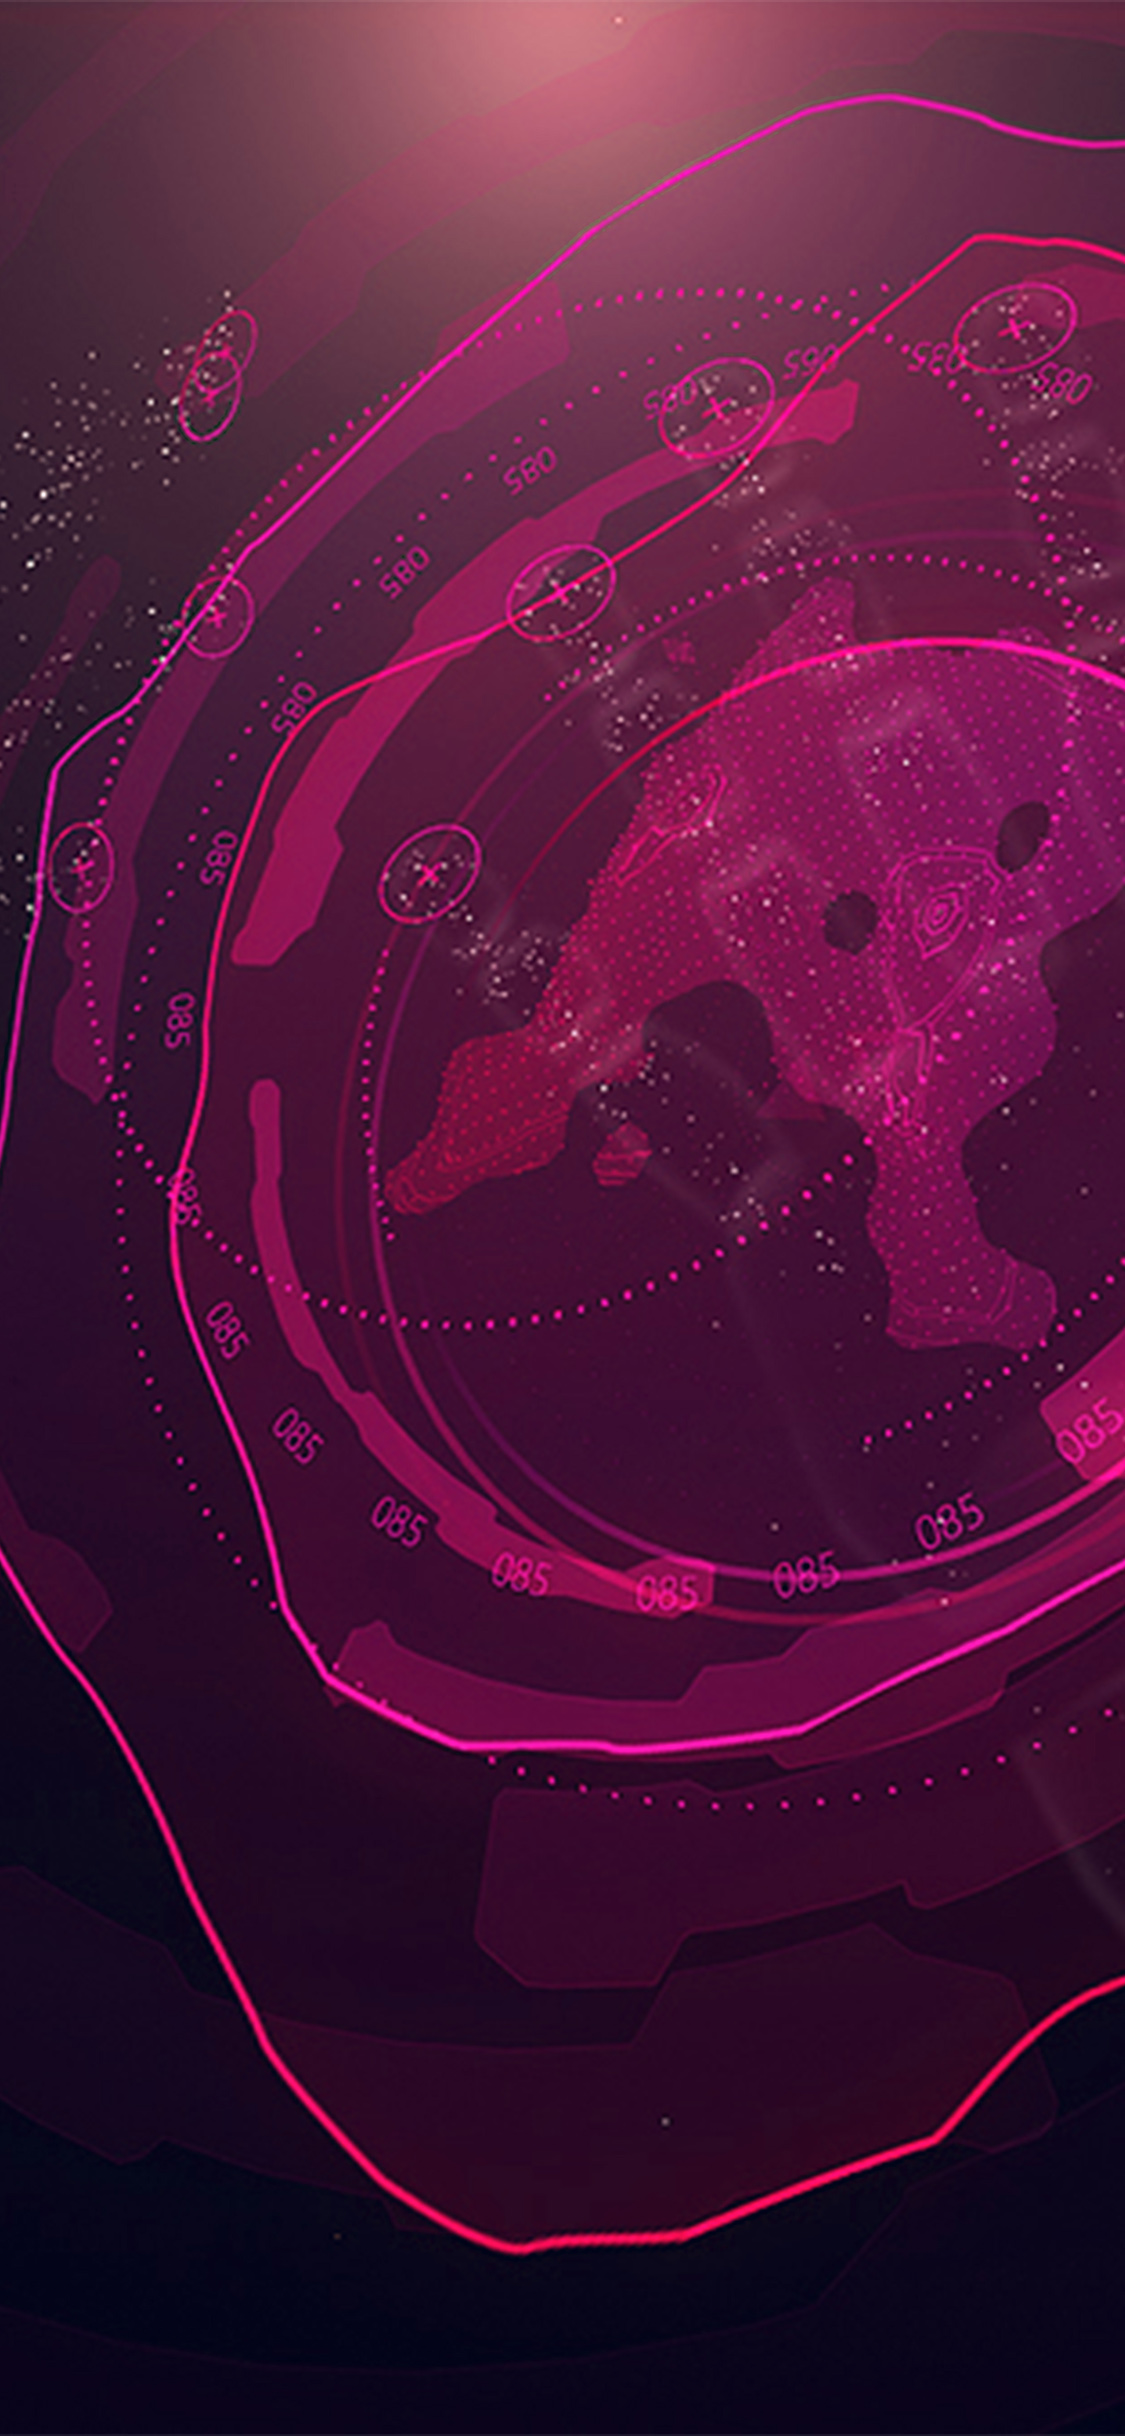 Vx09 Digital Purple Sign Pattern Background Wallpaper